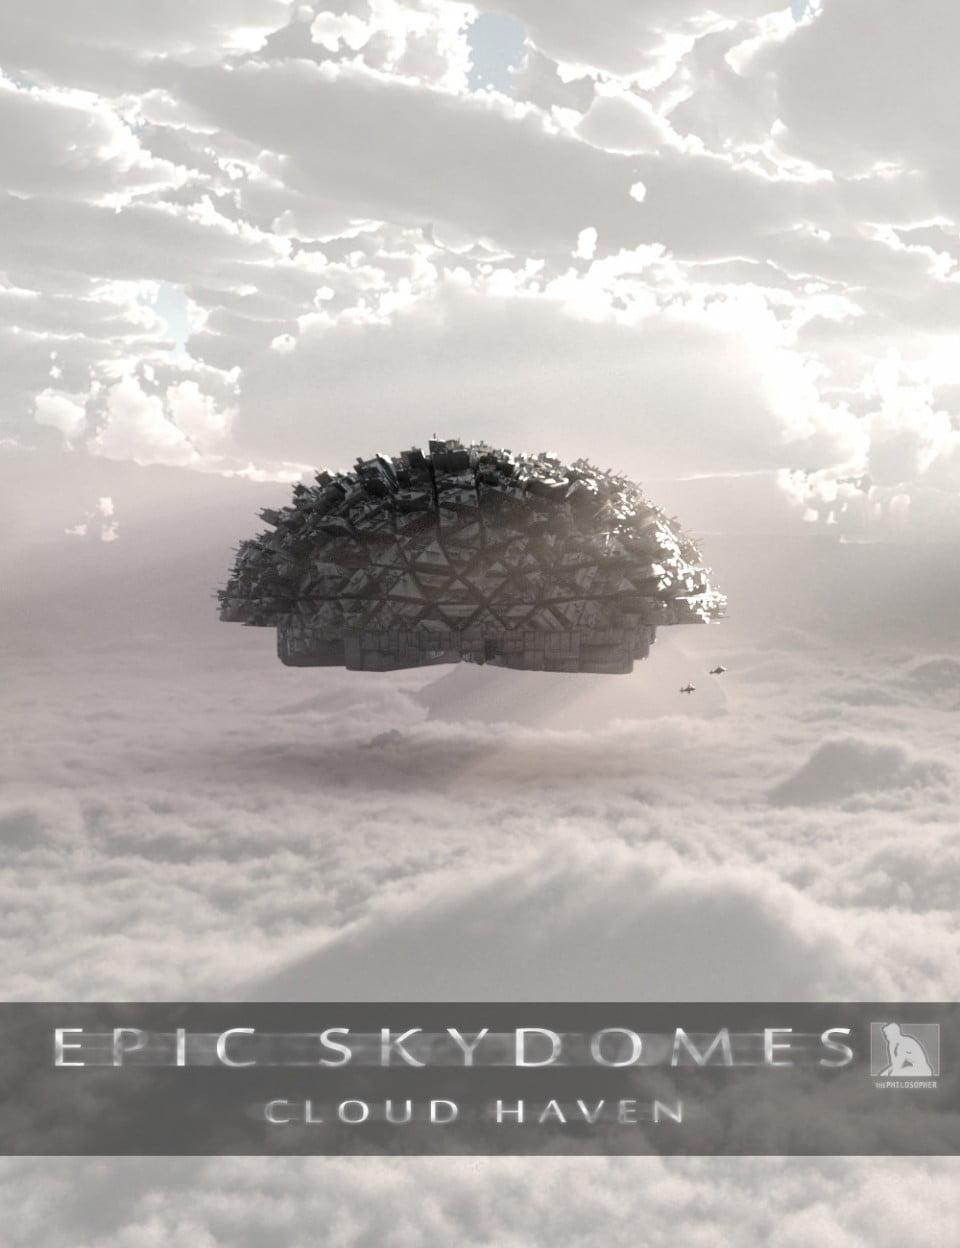 Epic Skydomes Cloud Haven HDRI